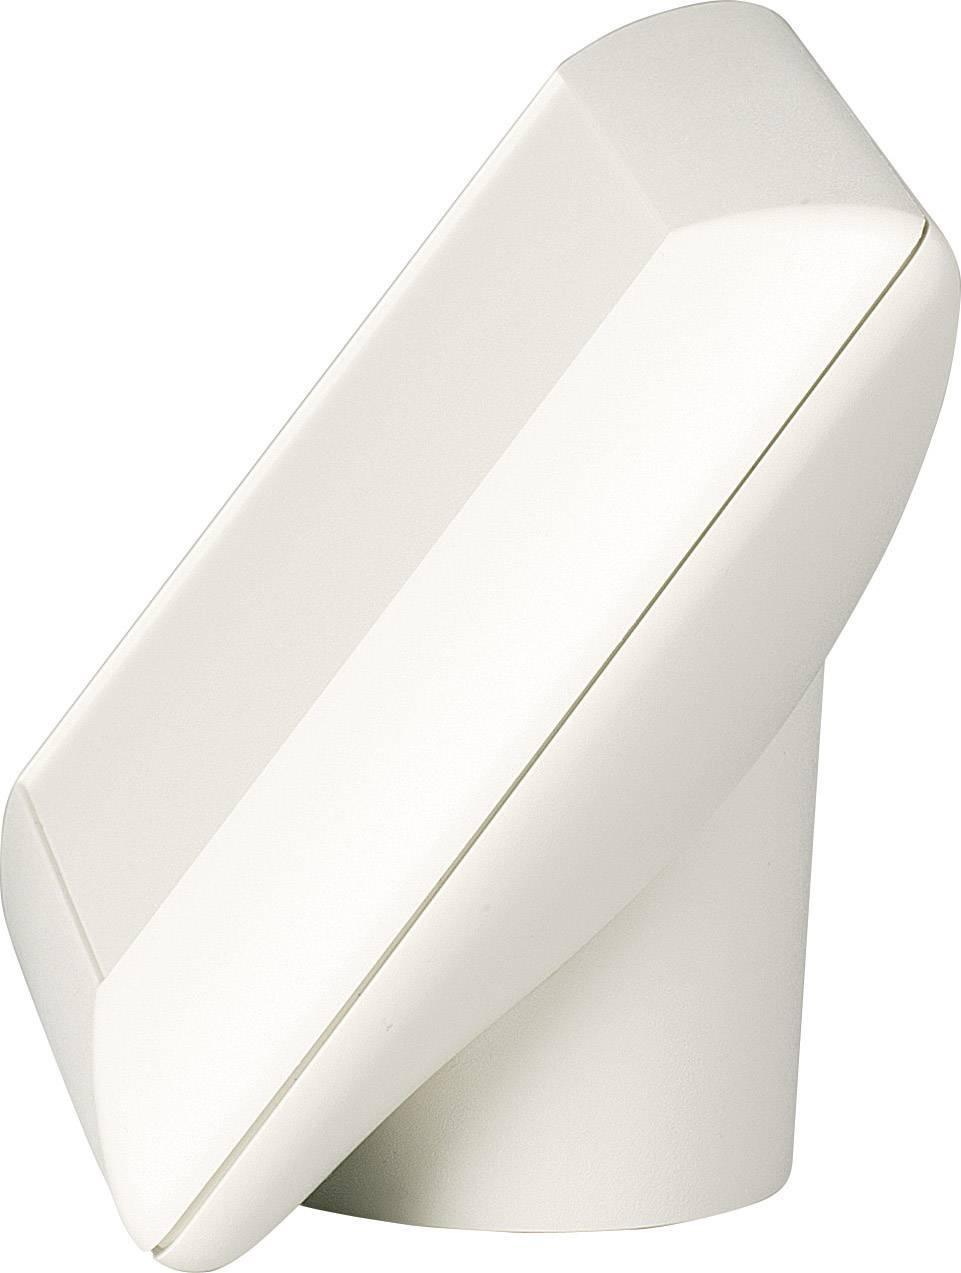 Skrinka na ovládací pult OKW Art-Case D5012607, 110 x 110 x 65 mm, ABS, sivobiela (RAL 9002), 1 sada